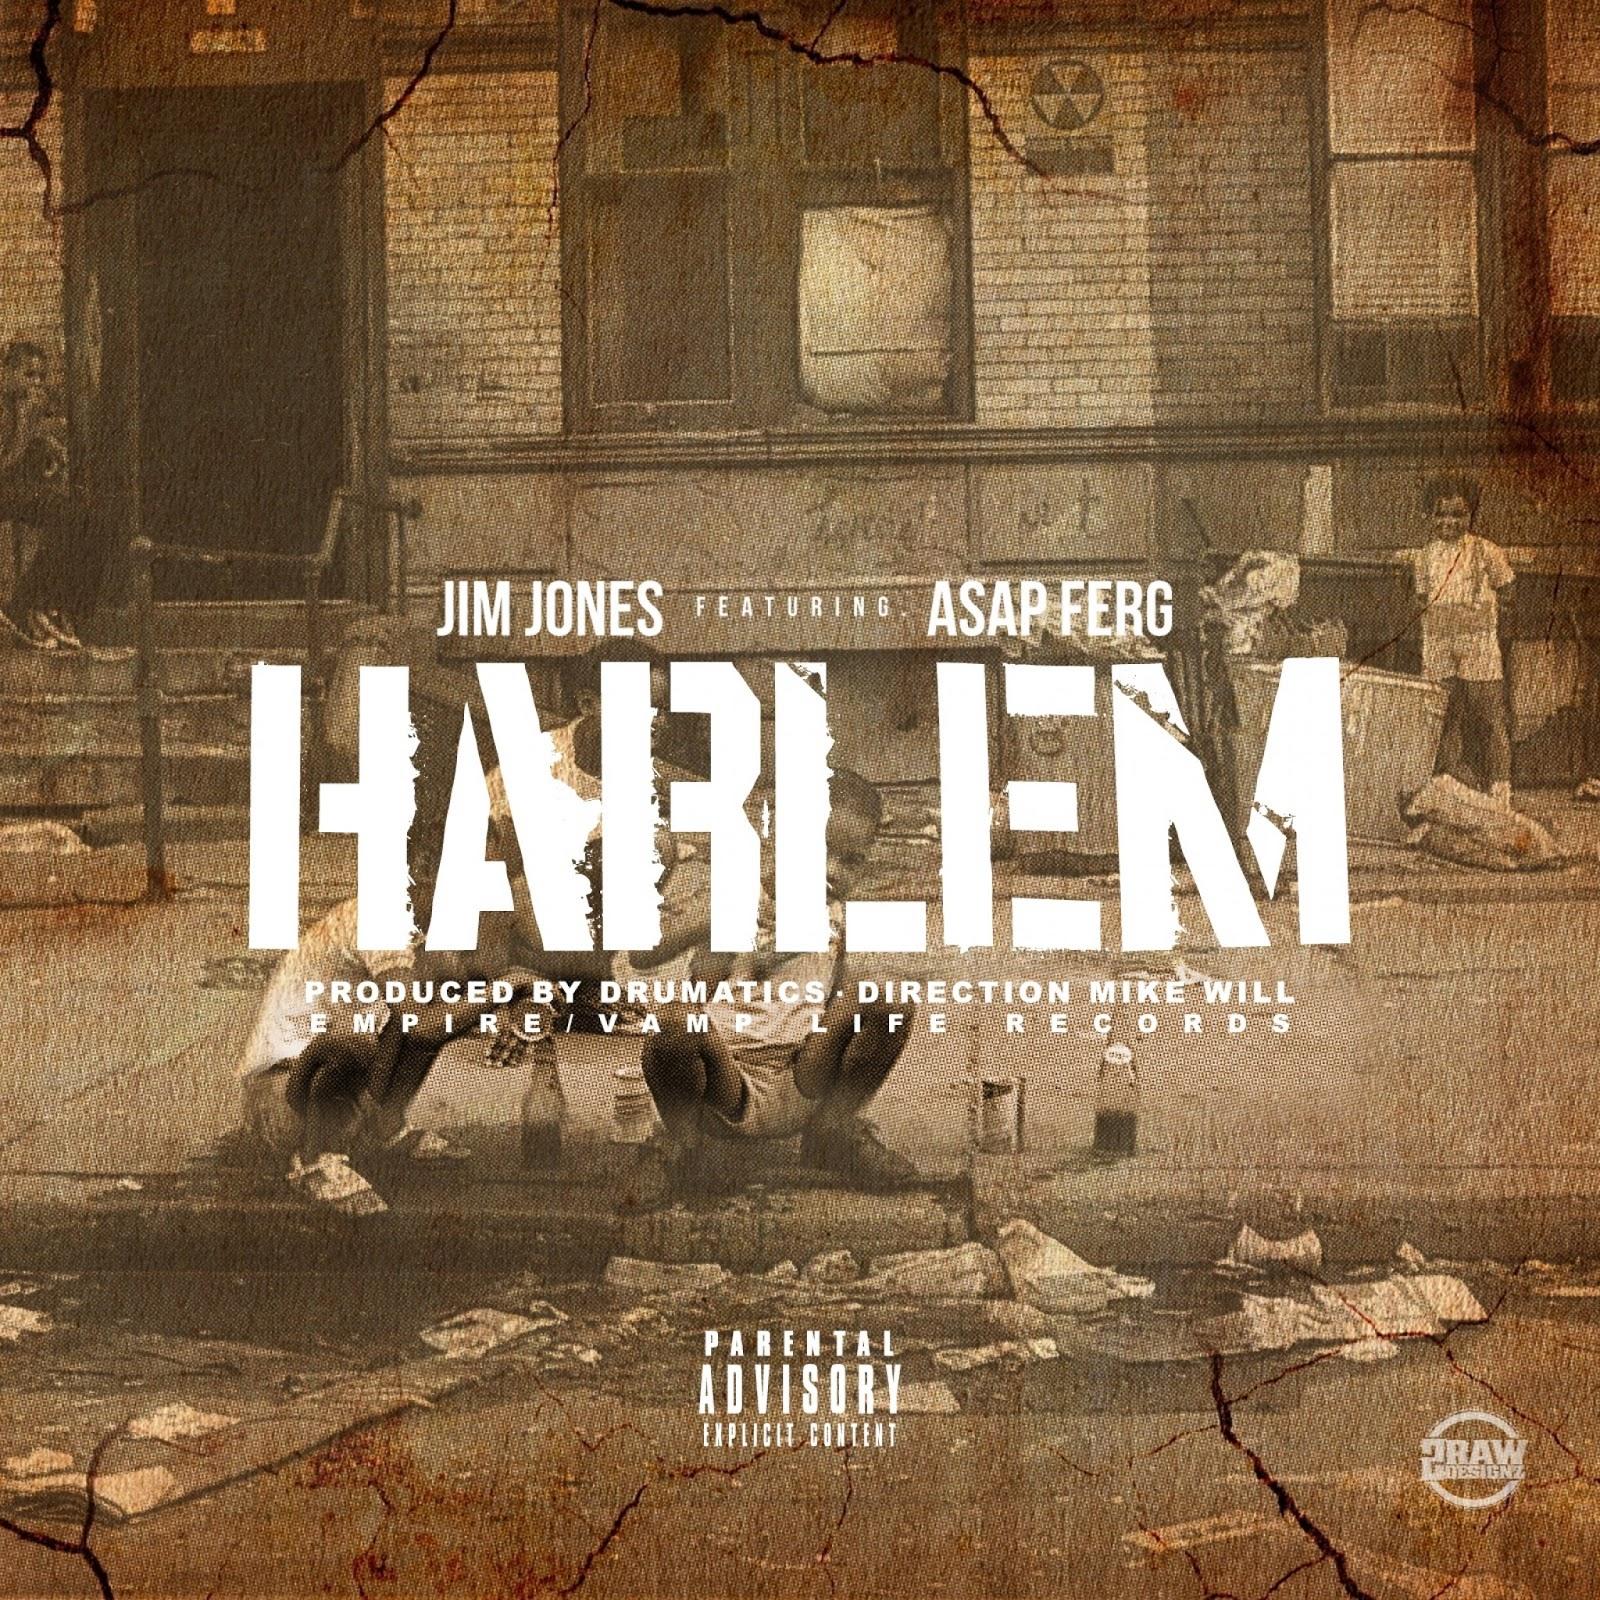 Jim Jones - Harlem (feat. A$AP Ferg) - Single Cover